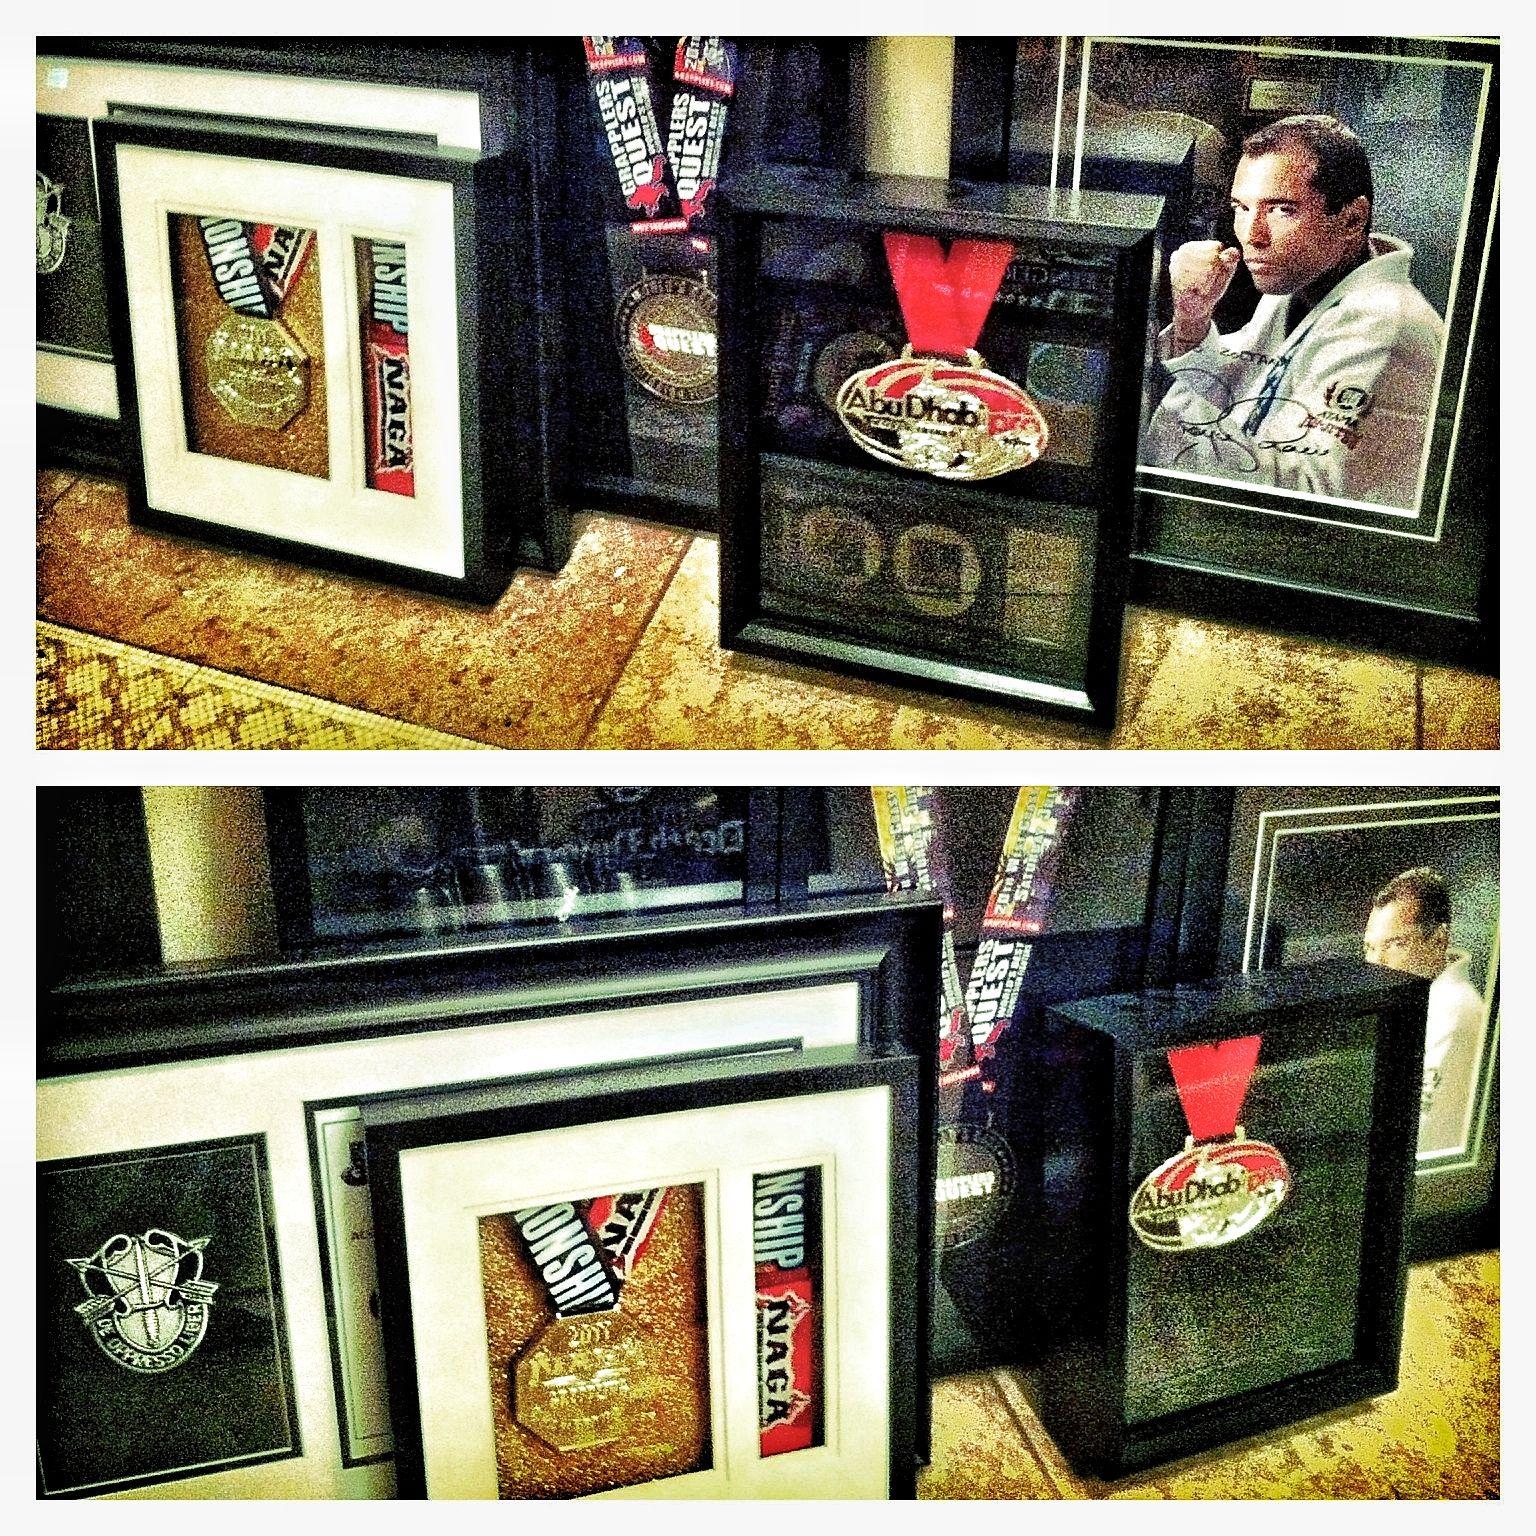 Zoltan Bathory - of Five Finger Death Punch - Jiu-Jitsu Medals